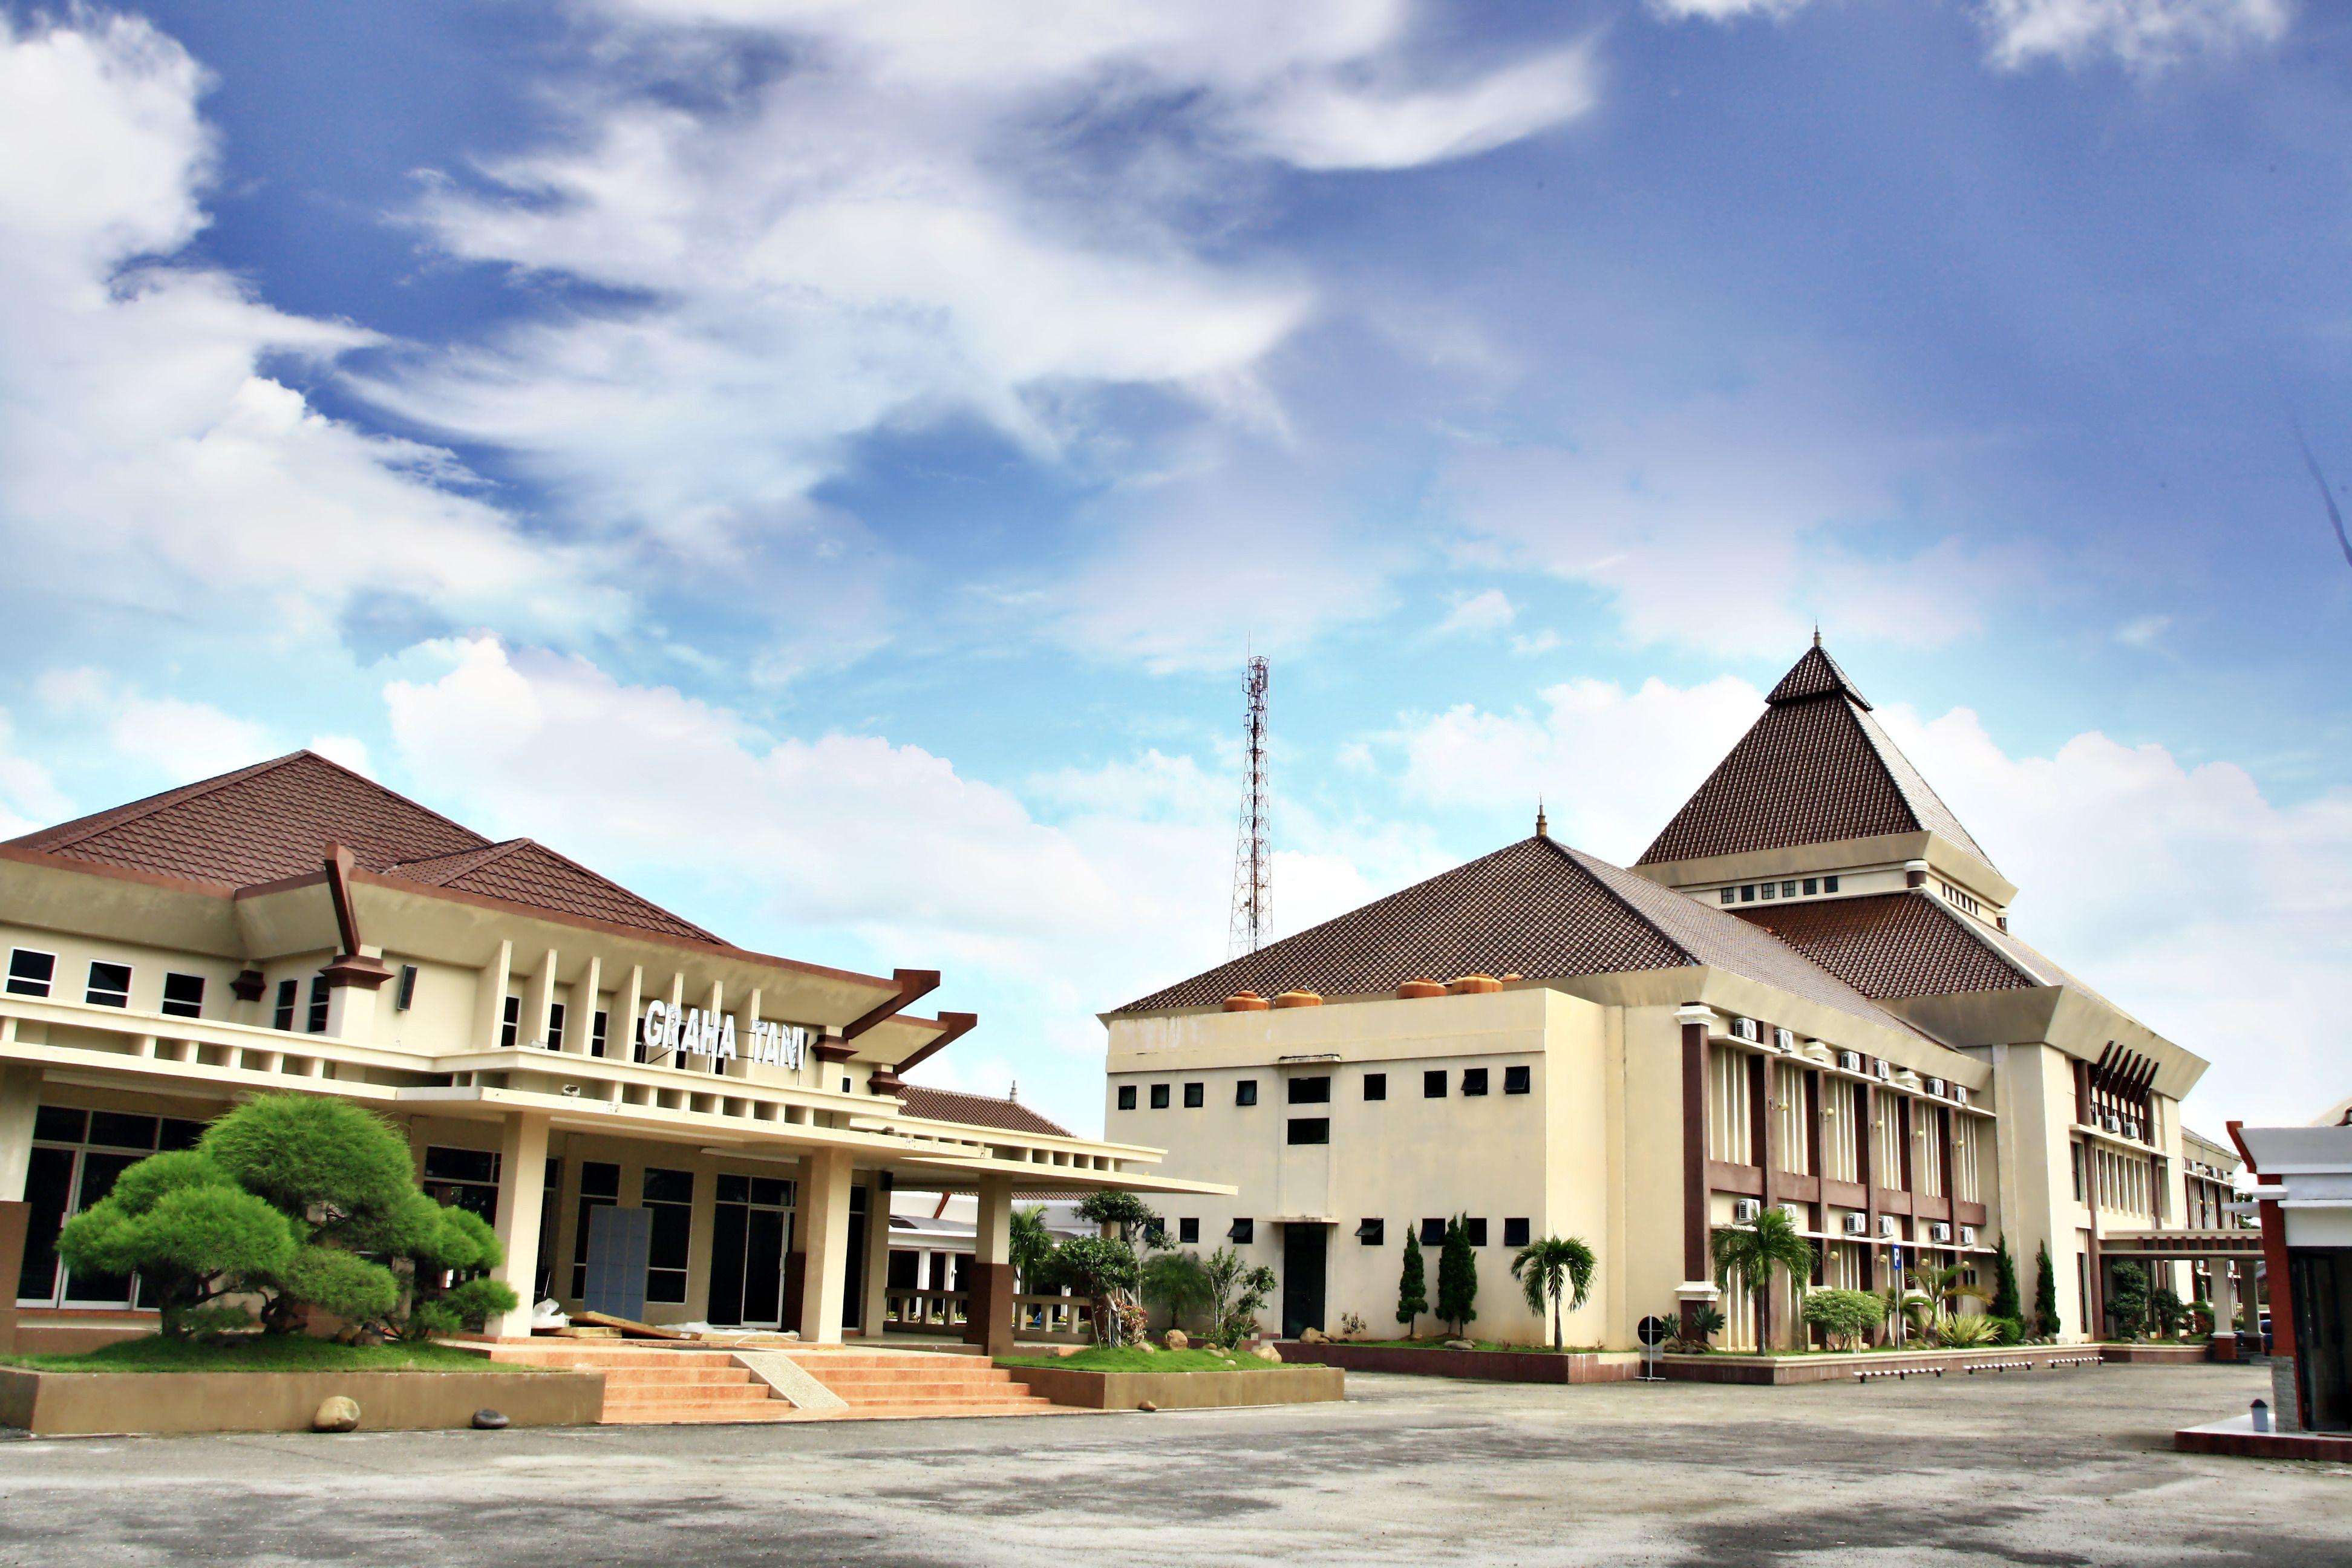 Parai Puri Tani Hotel, Ogan Komering Ulu Timur